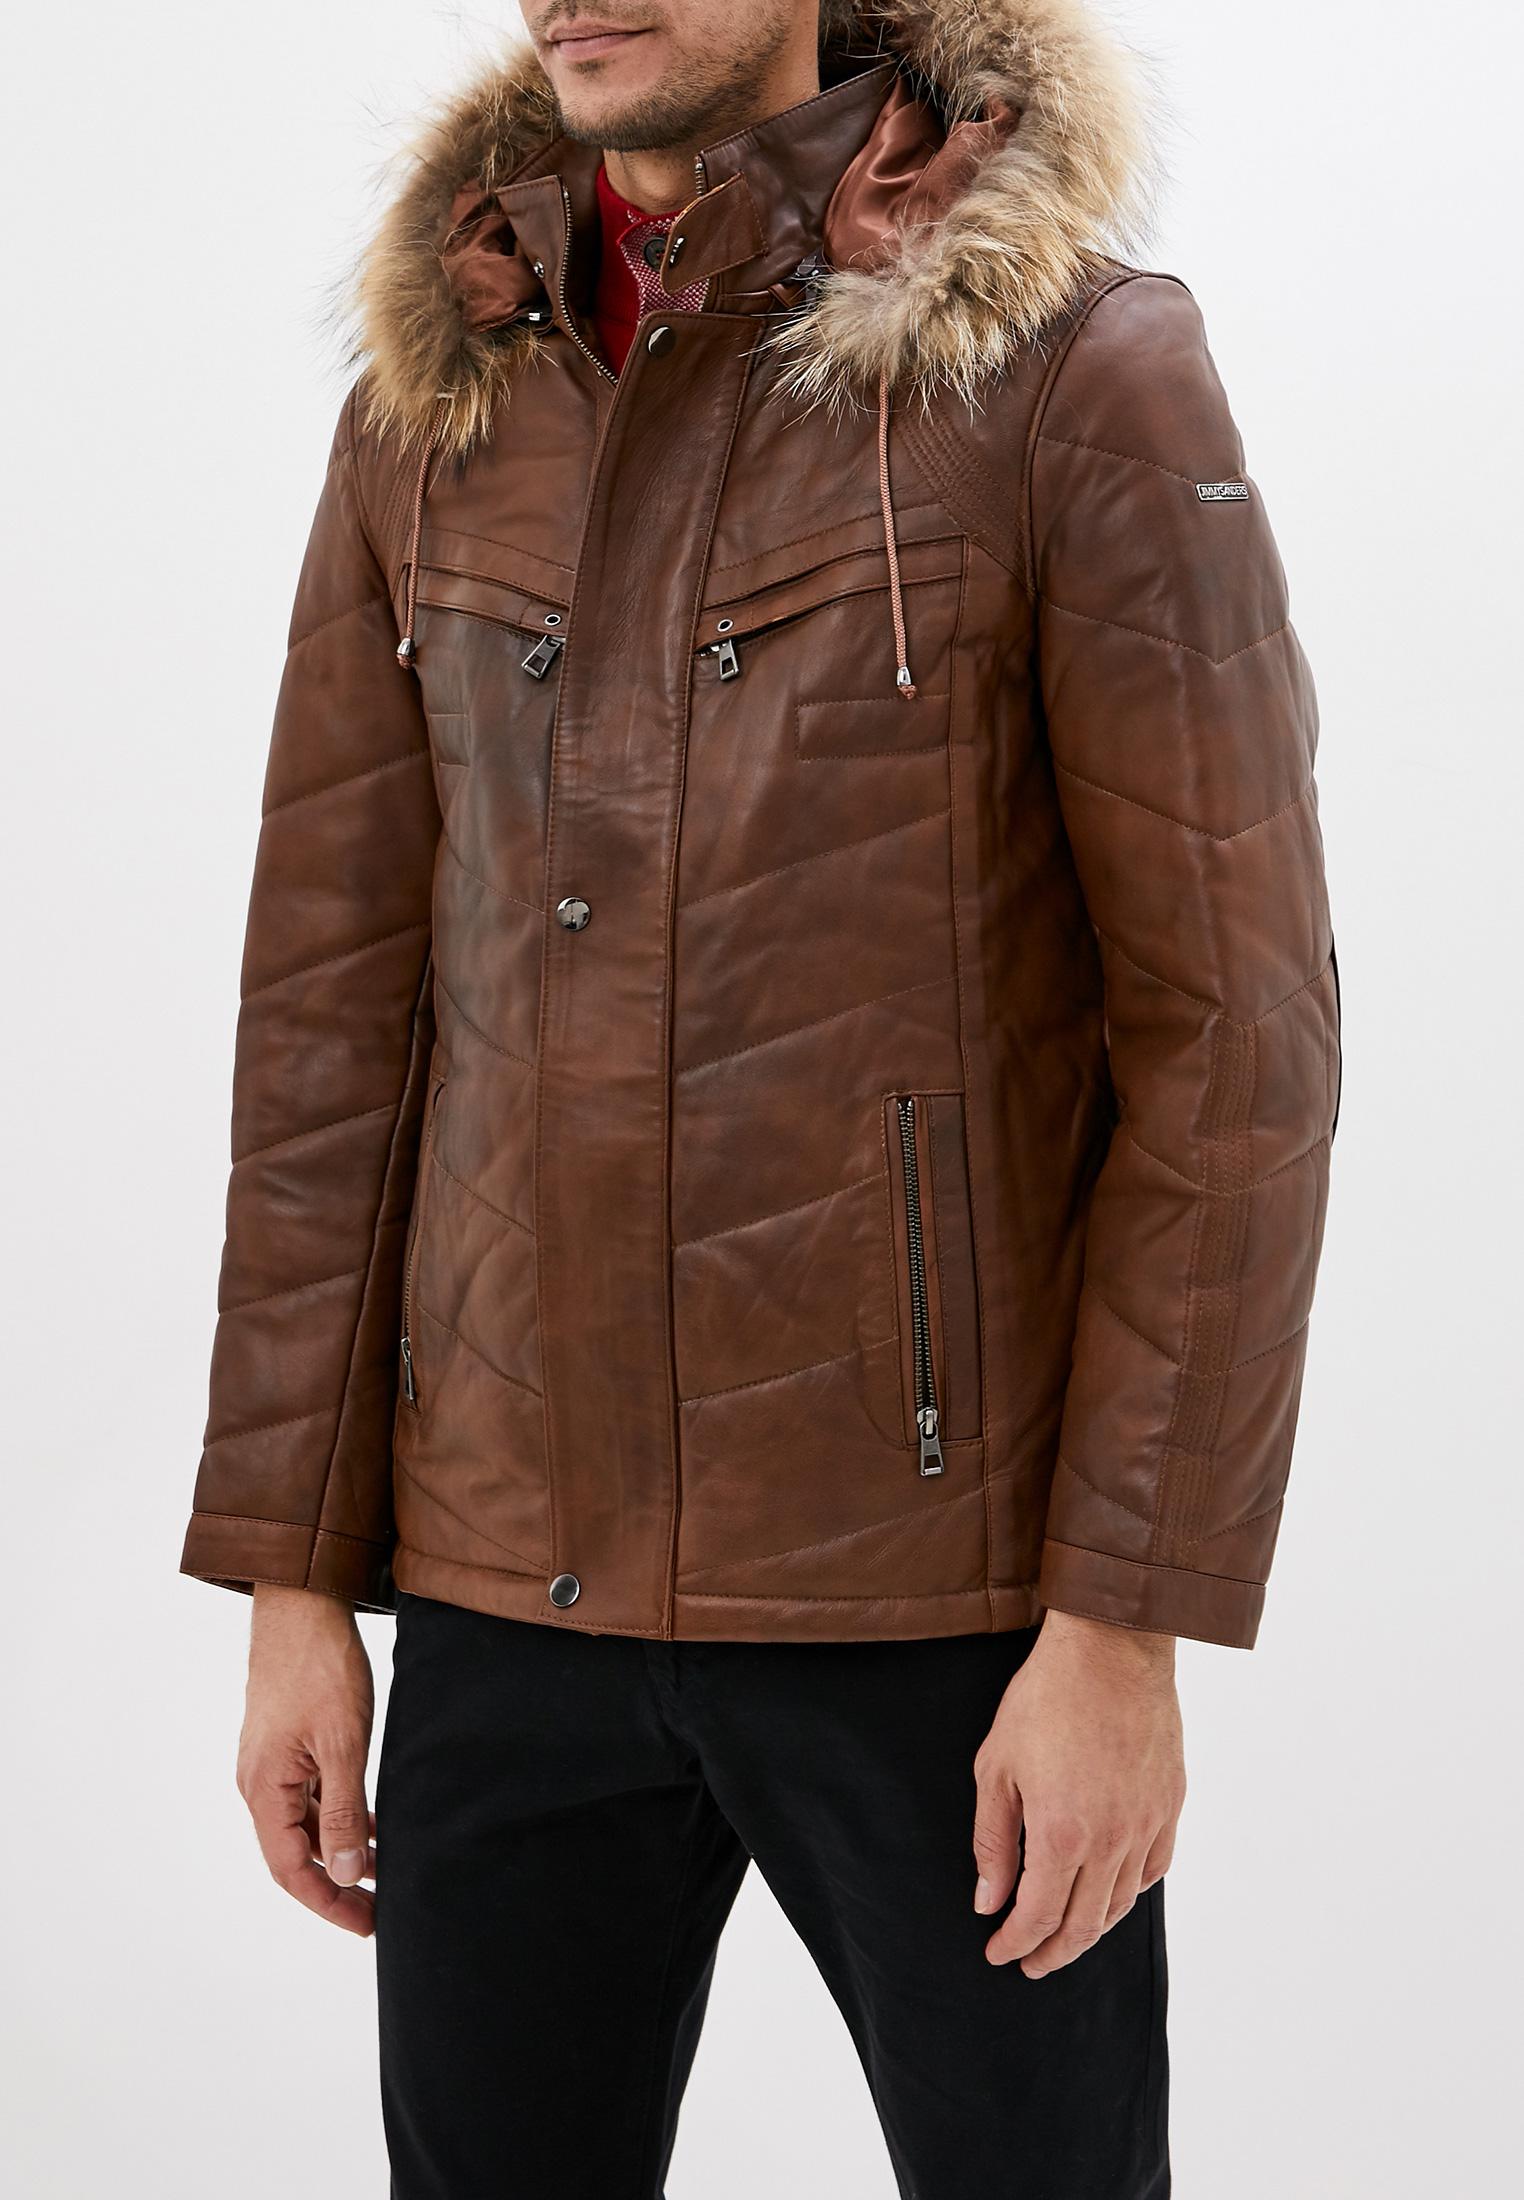 Кожаная куртка JIMMY SANDERS (Джимми Сандерс) 18F CTM22007